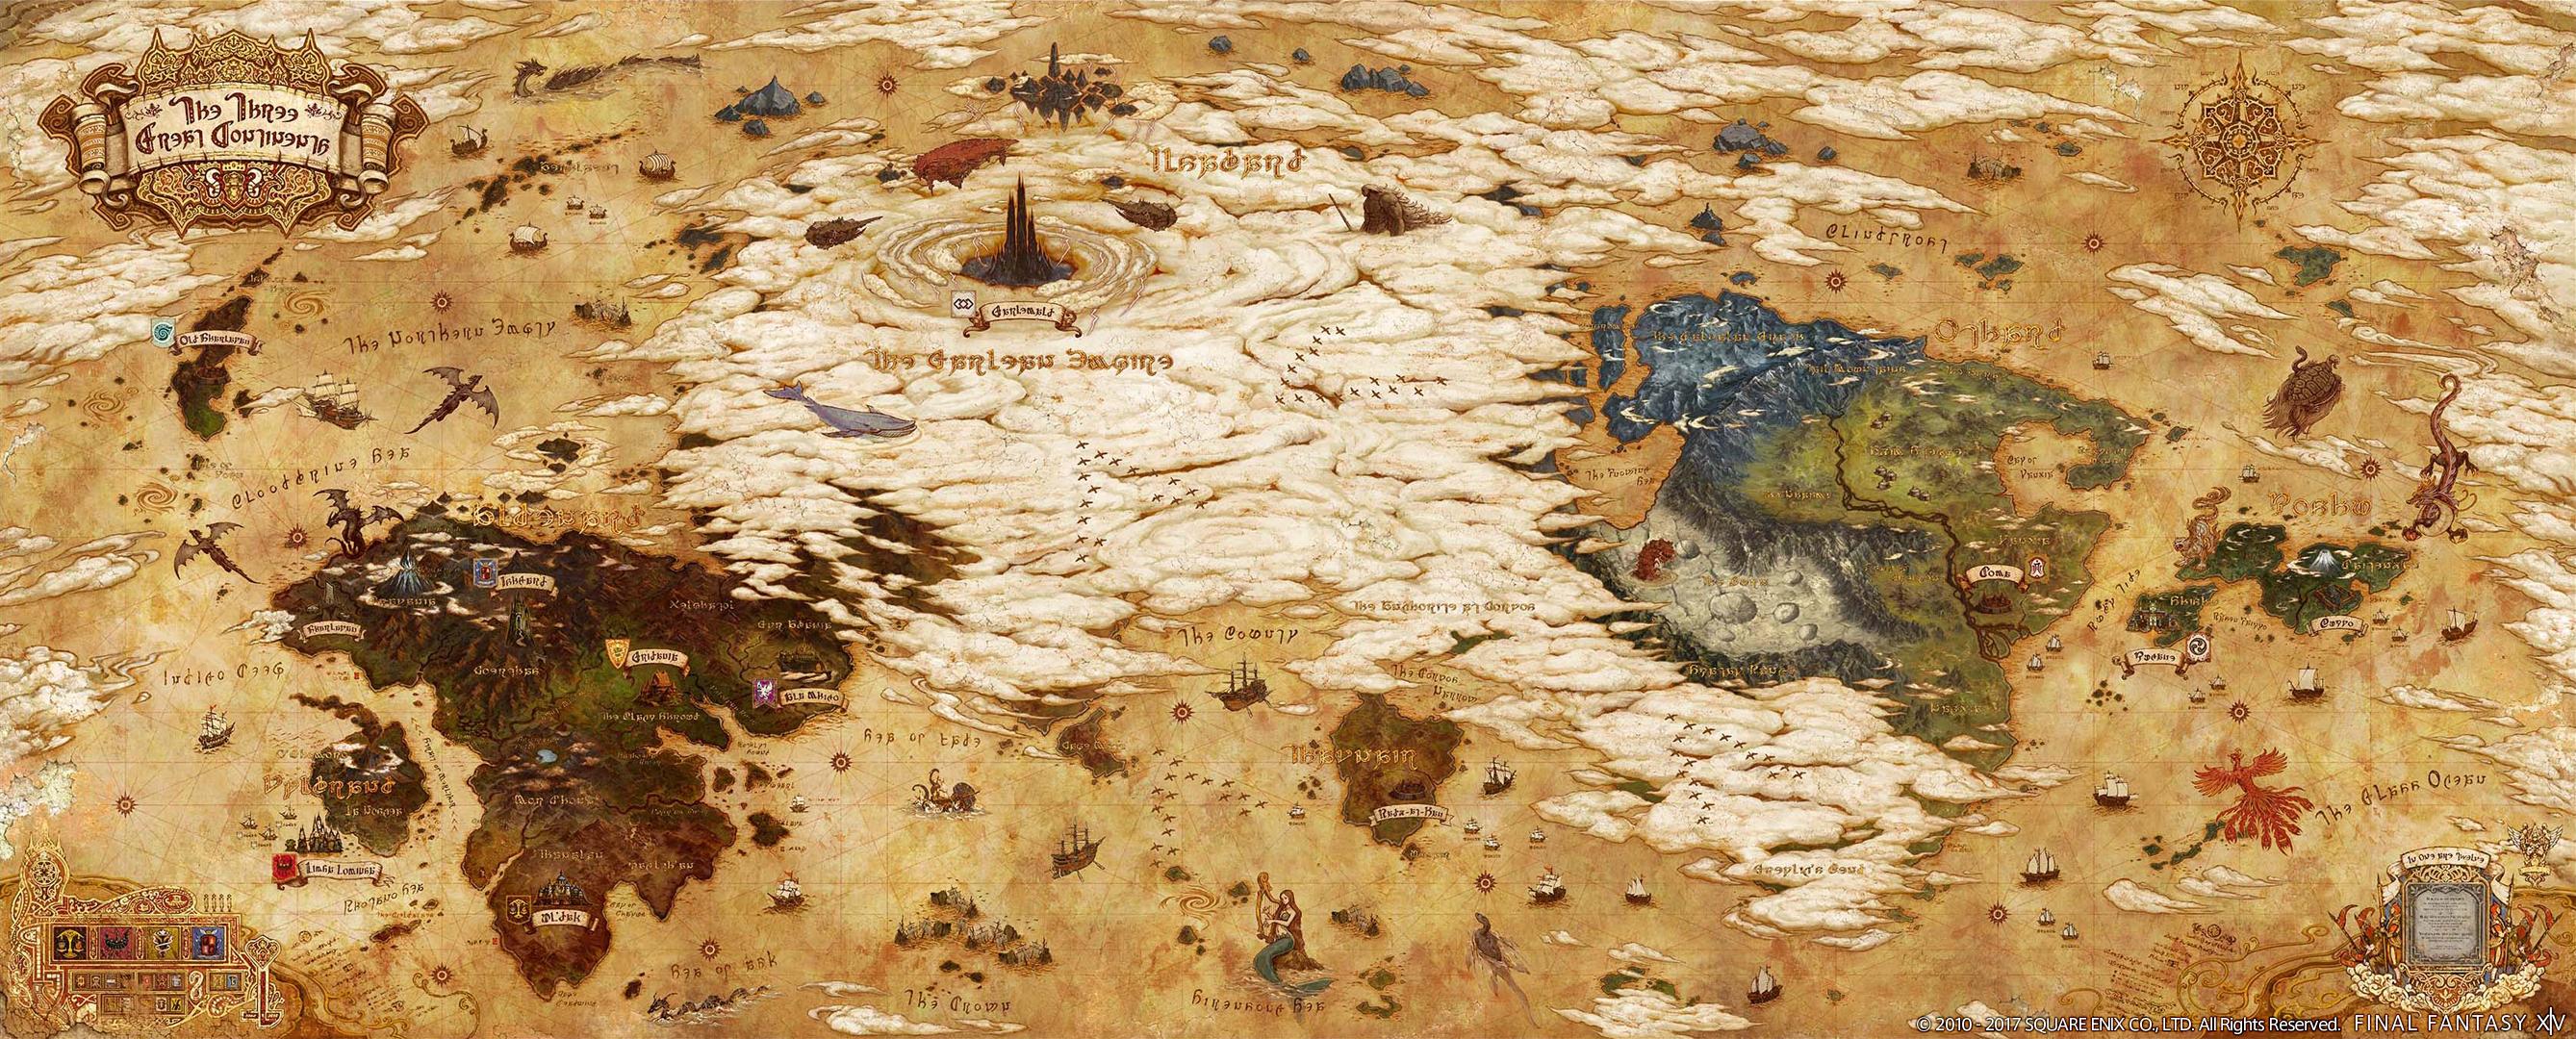 Final Fantasy XIV: Stormblood Image 1